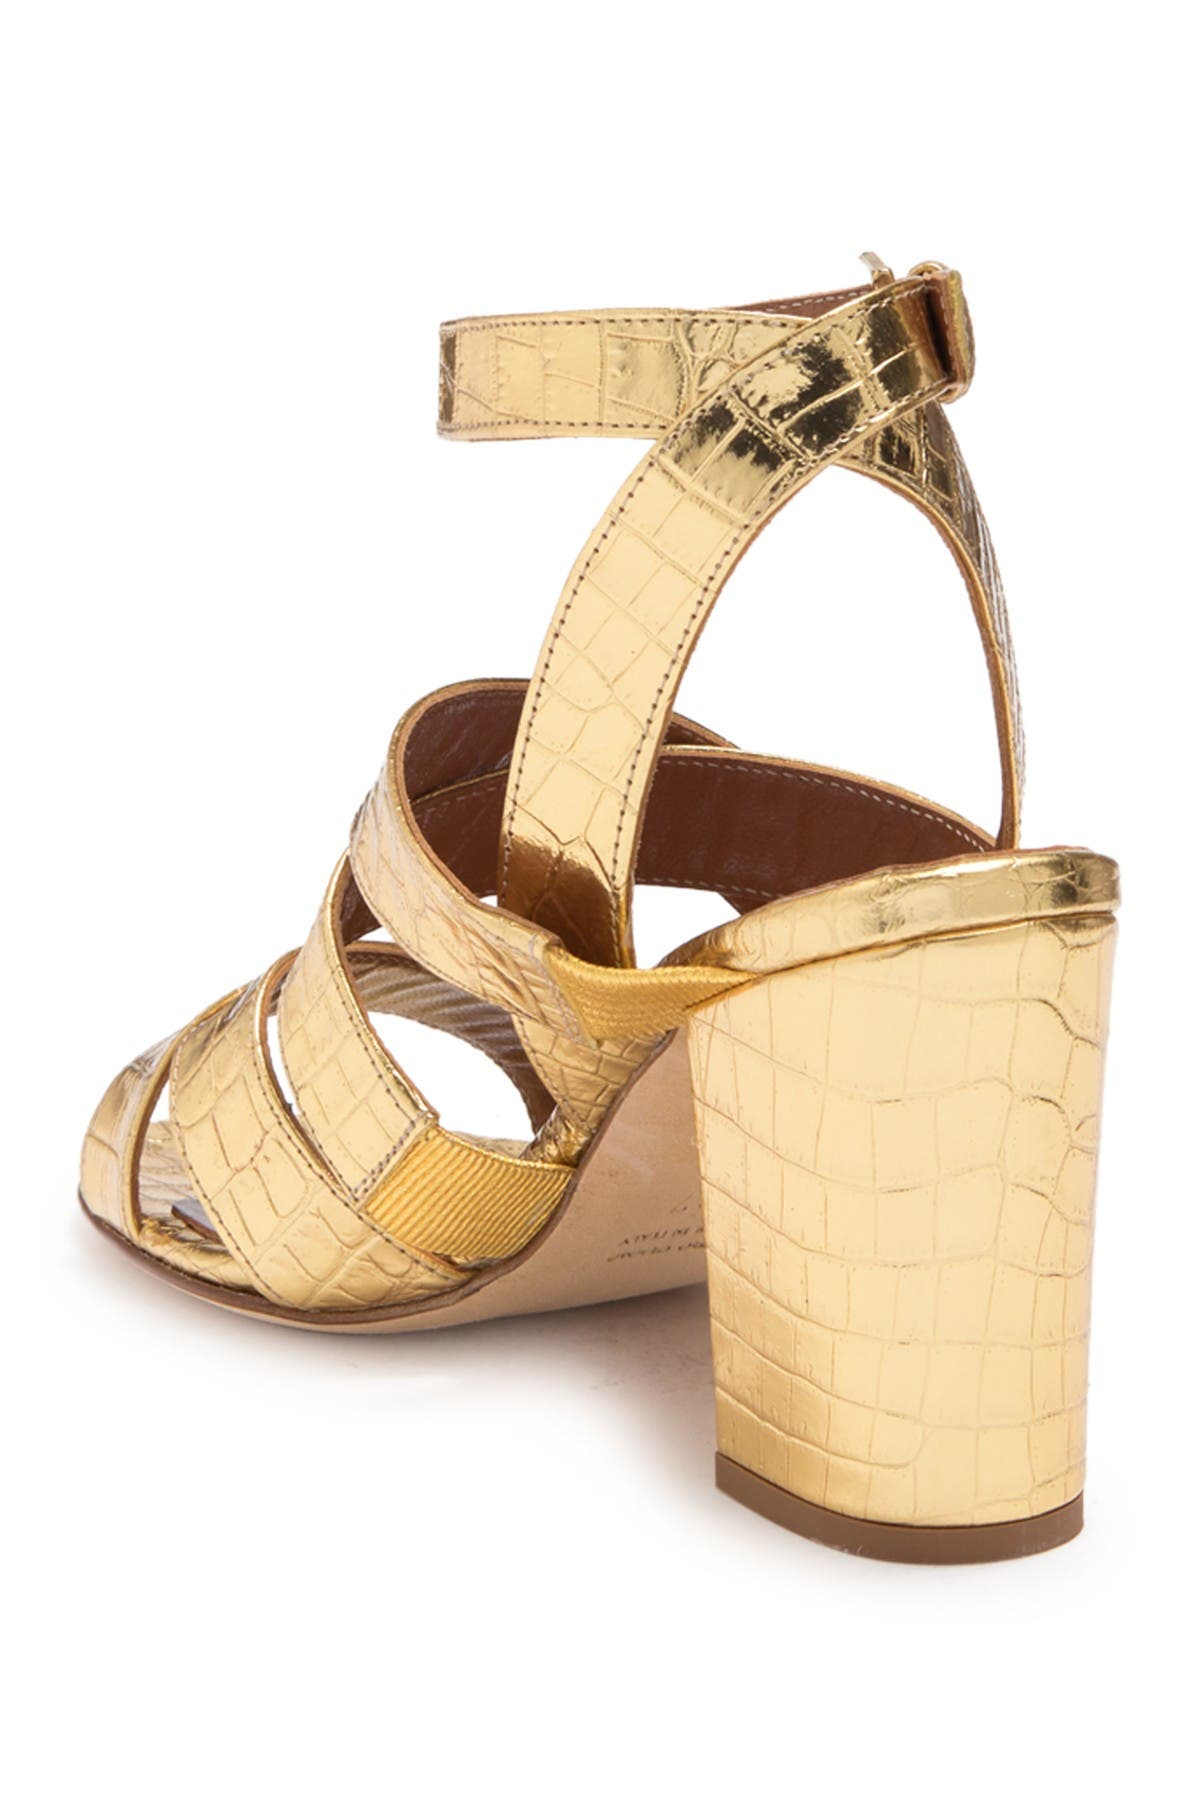 Image of PARIS TEXAS Metallic Croc Embossed Print Strappy Block Heel Sandal